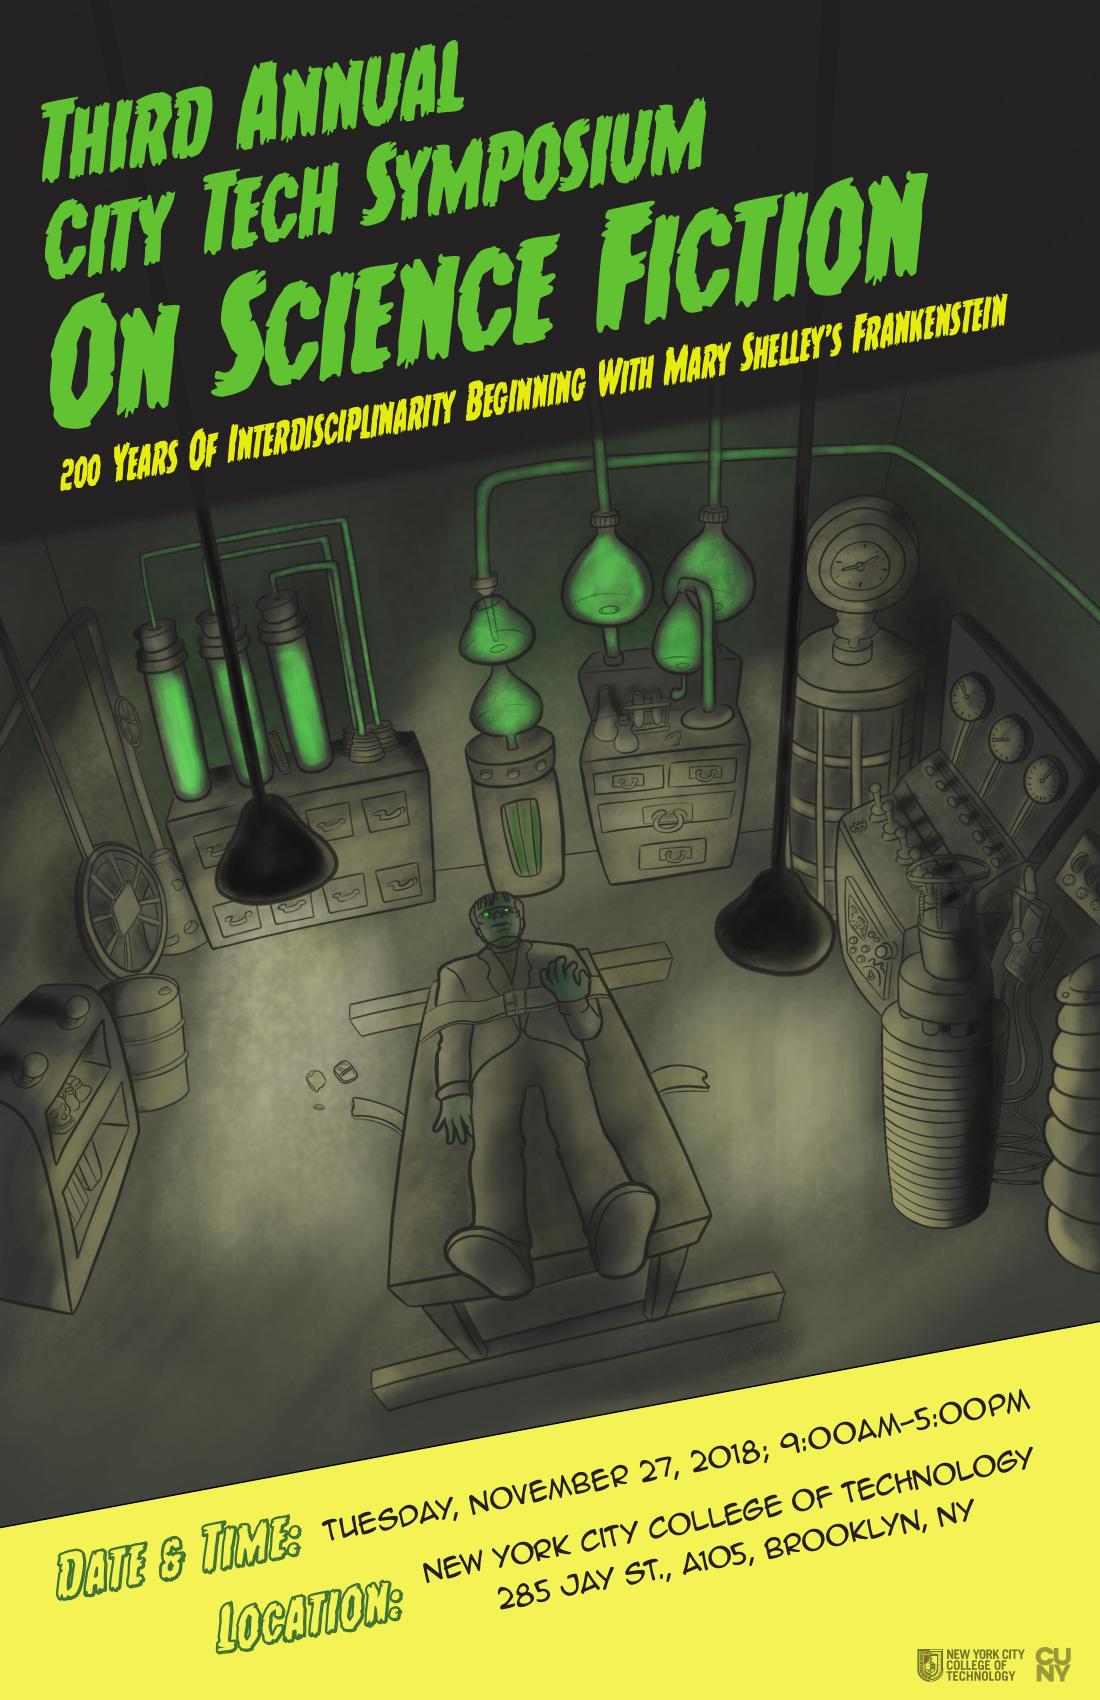 SF-symposium-3-poster